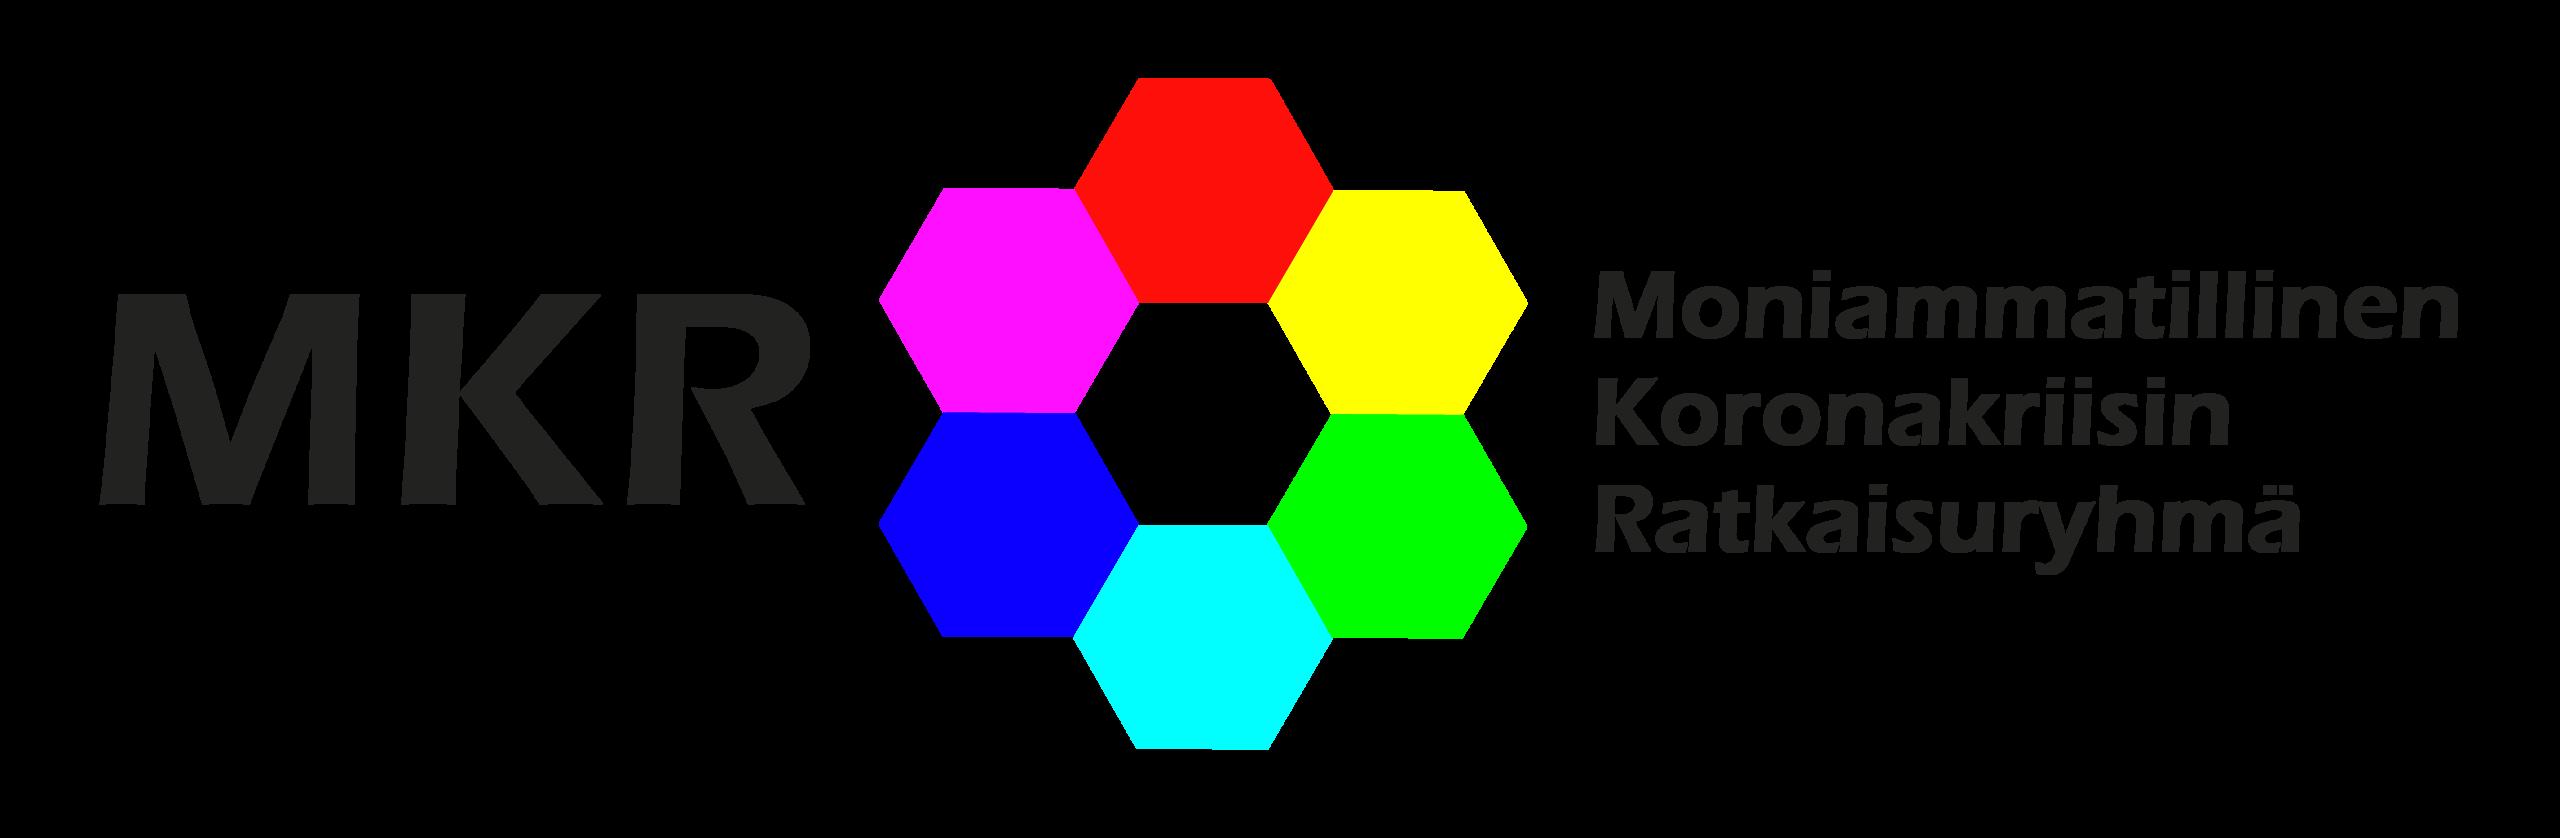 mkr_logo